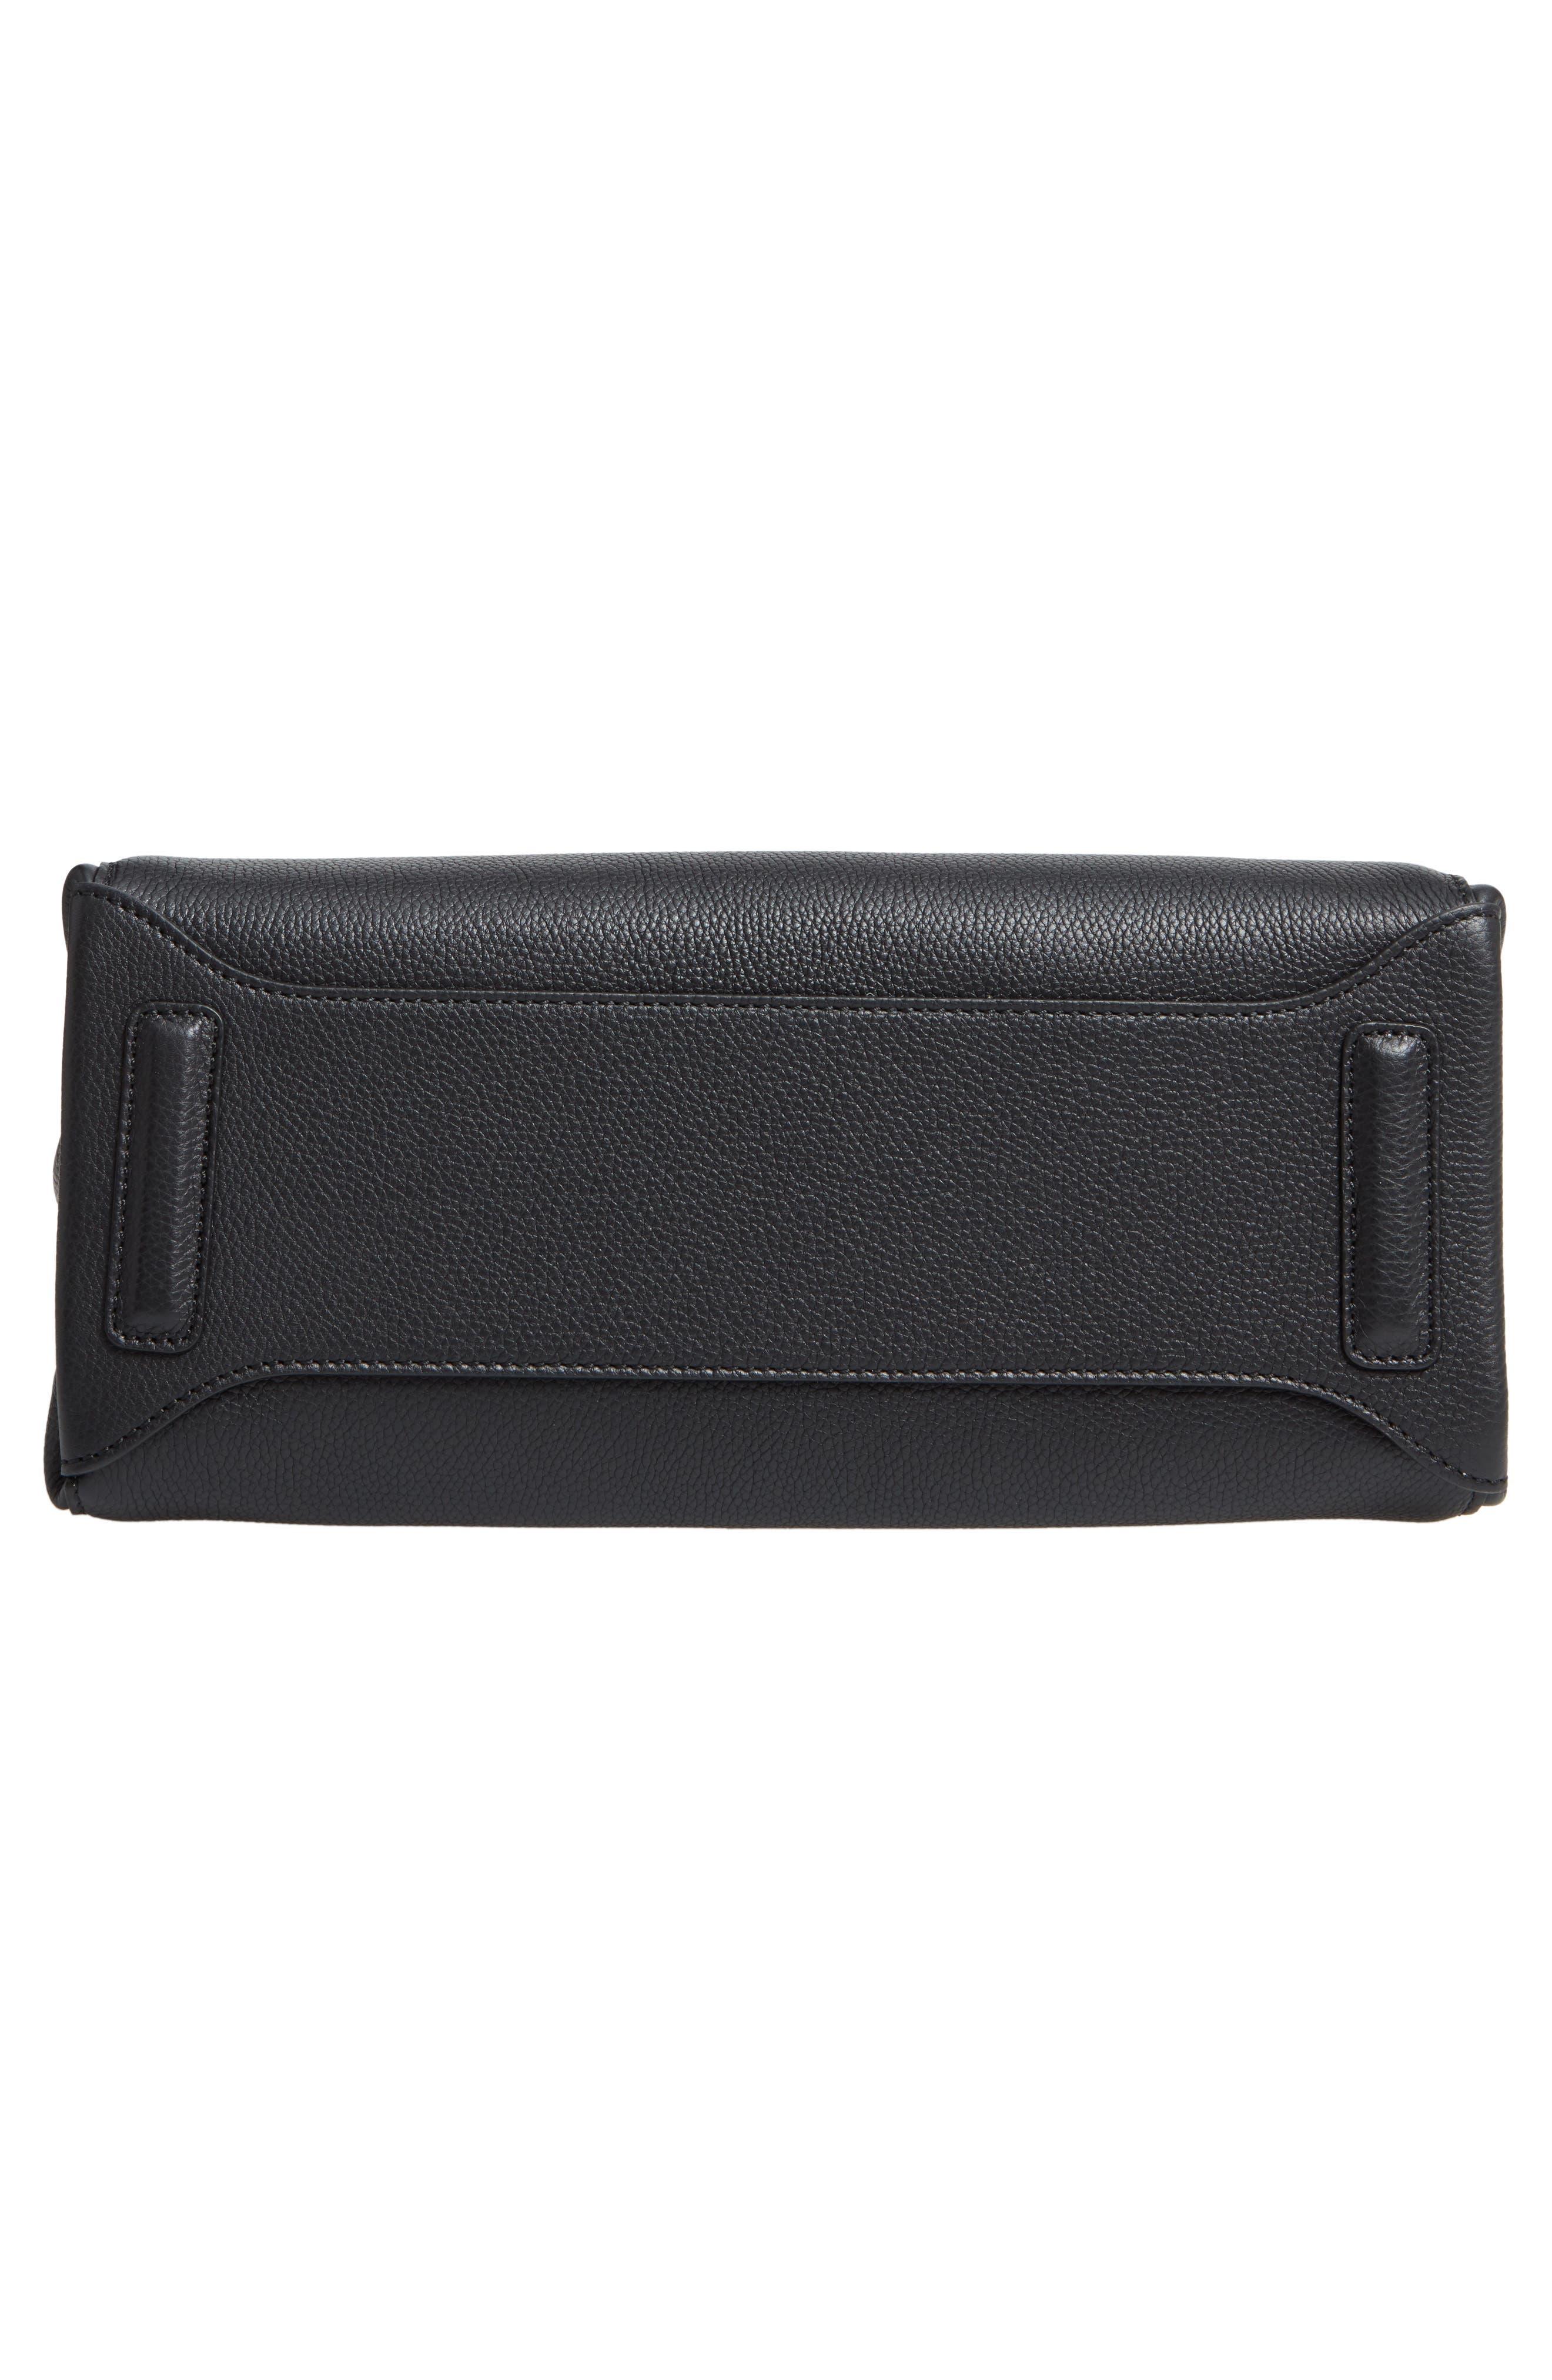 Small Meline Evolution Leather Bag,                             Alternate thumbnail 6, color,                             BLACK